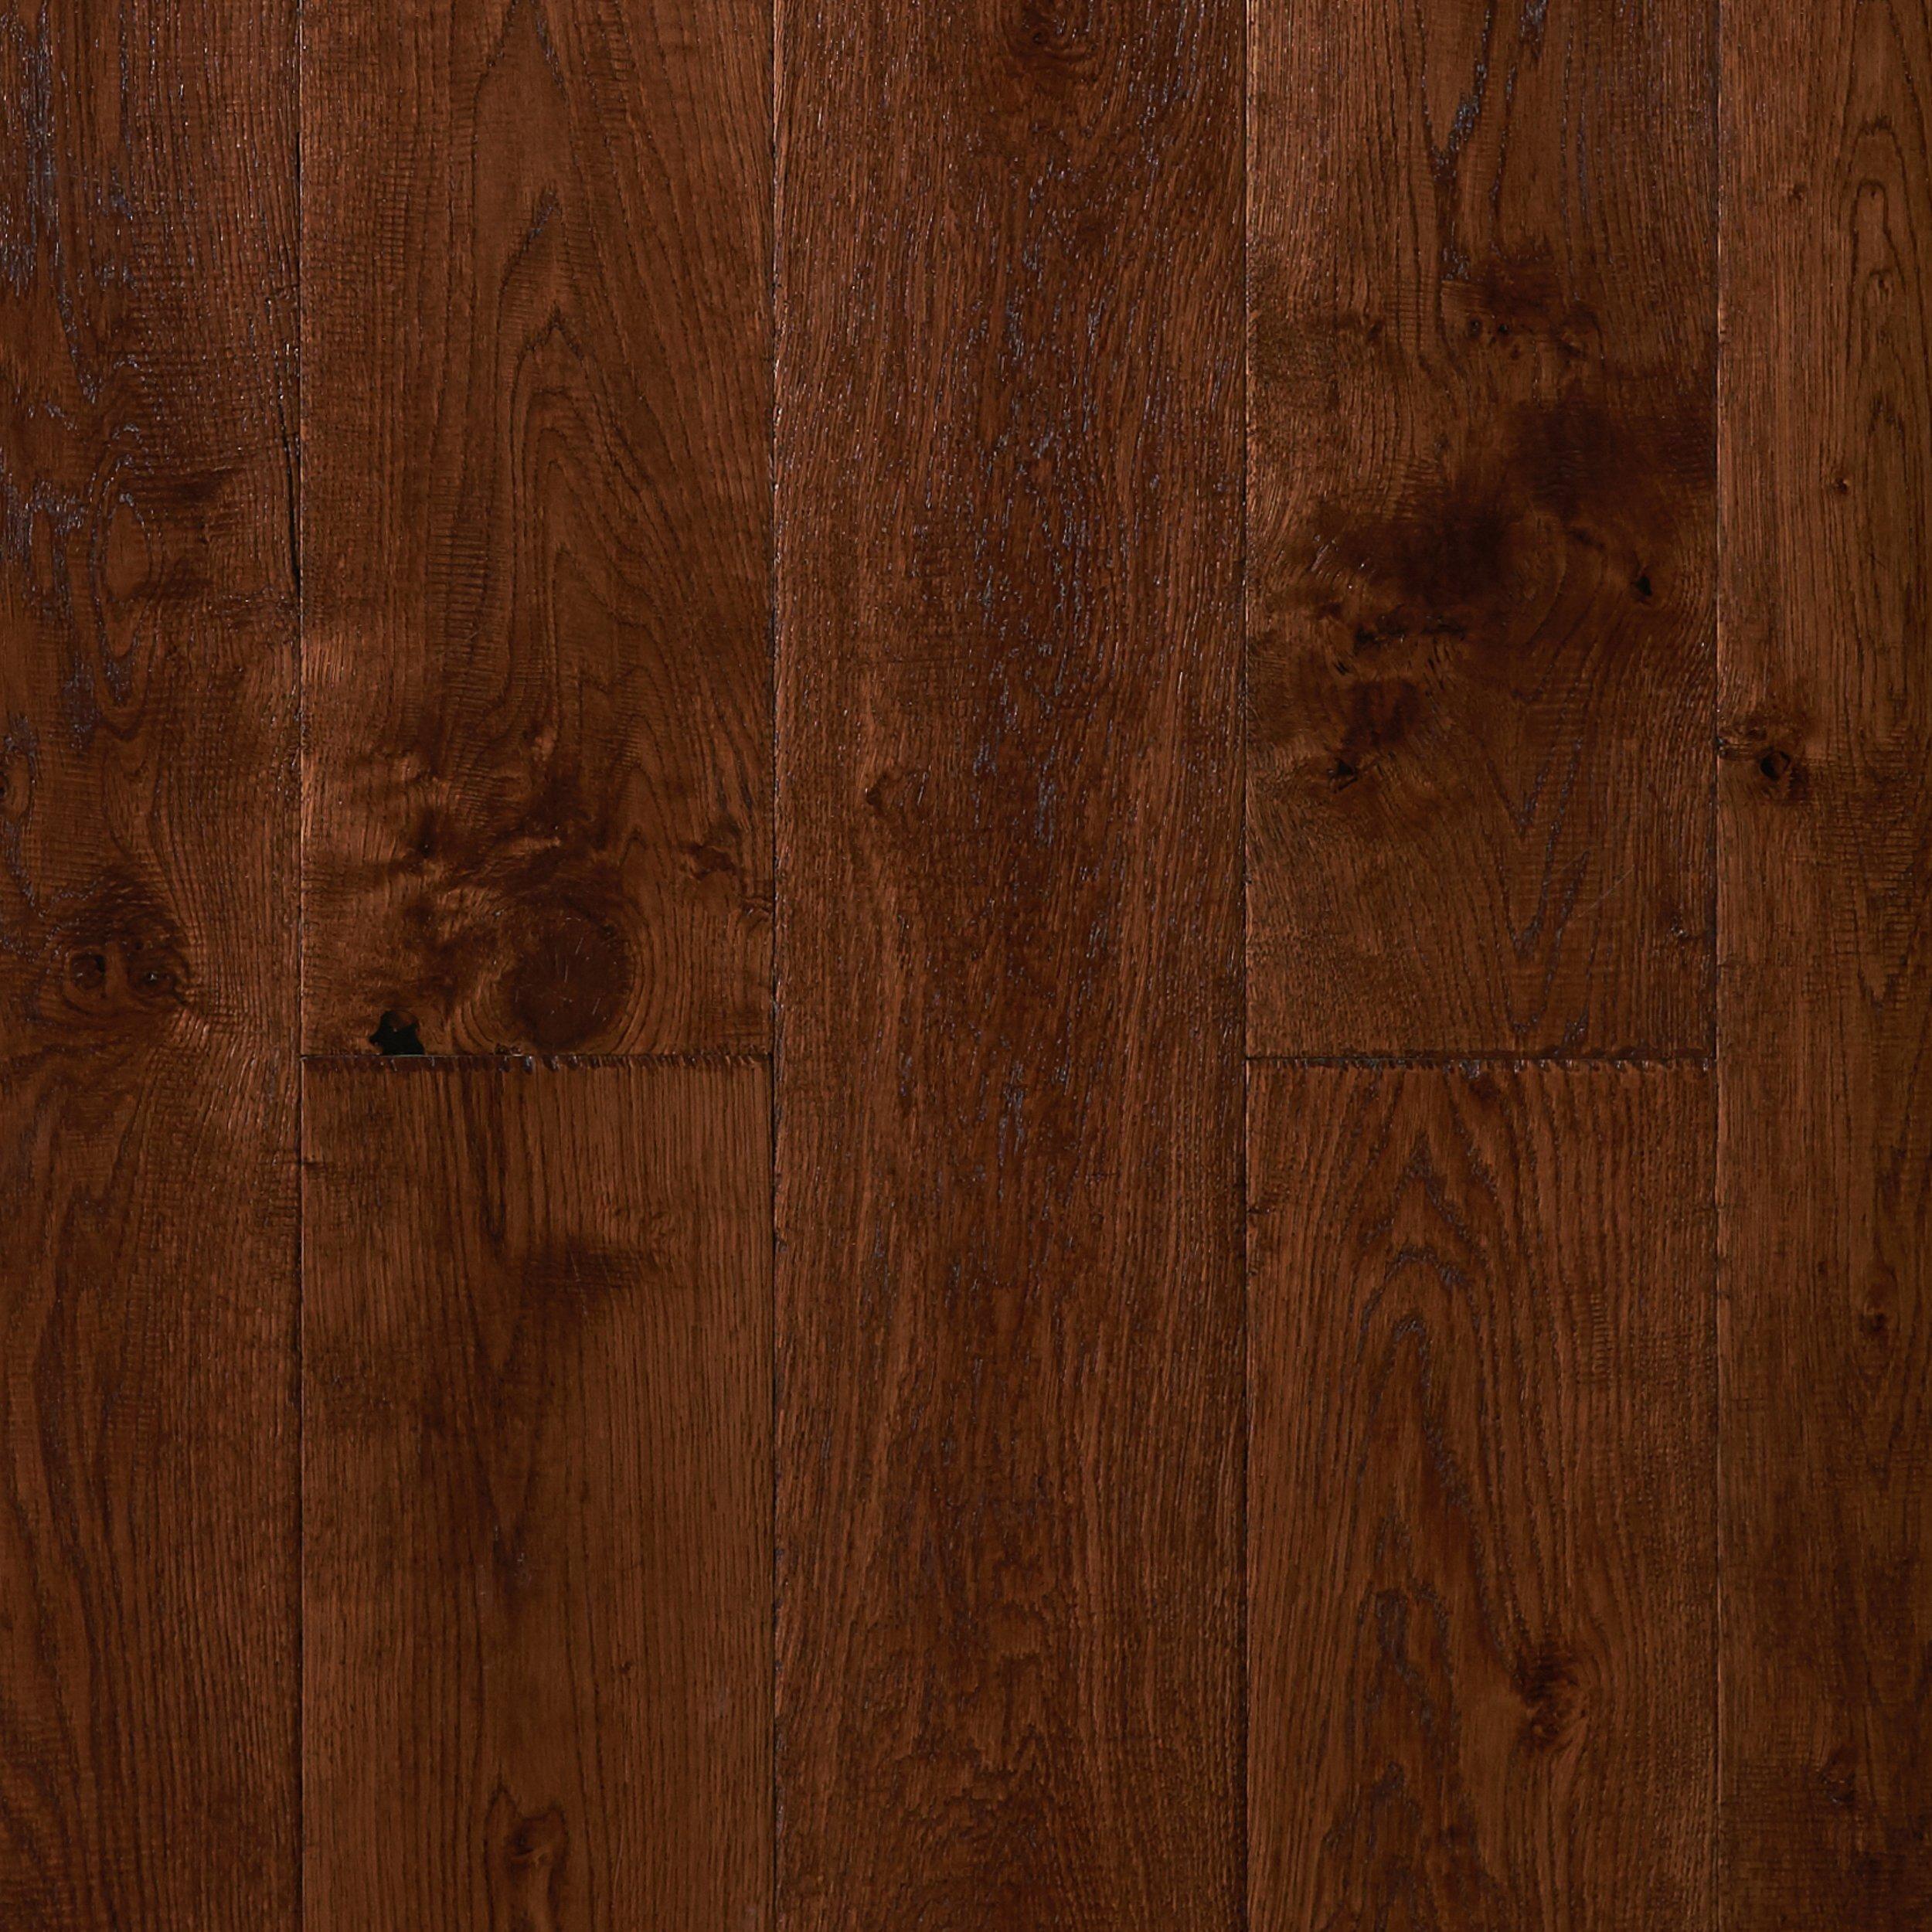 Lifescapes Amalfi Oak Hand Scraped Engineered Hardwood 1 2 Inch X 7 1 2 Inch Brown Floor Decor In 2020 Types Of Wood Flooring Engineered Hardwood Installing Hardwood Floors